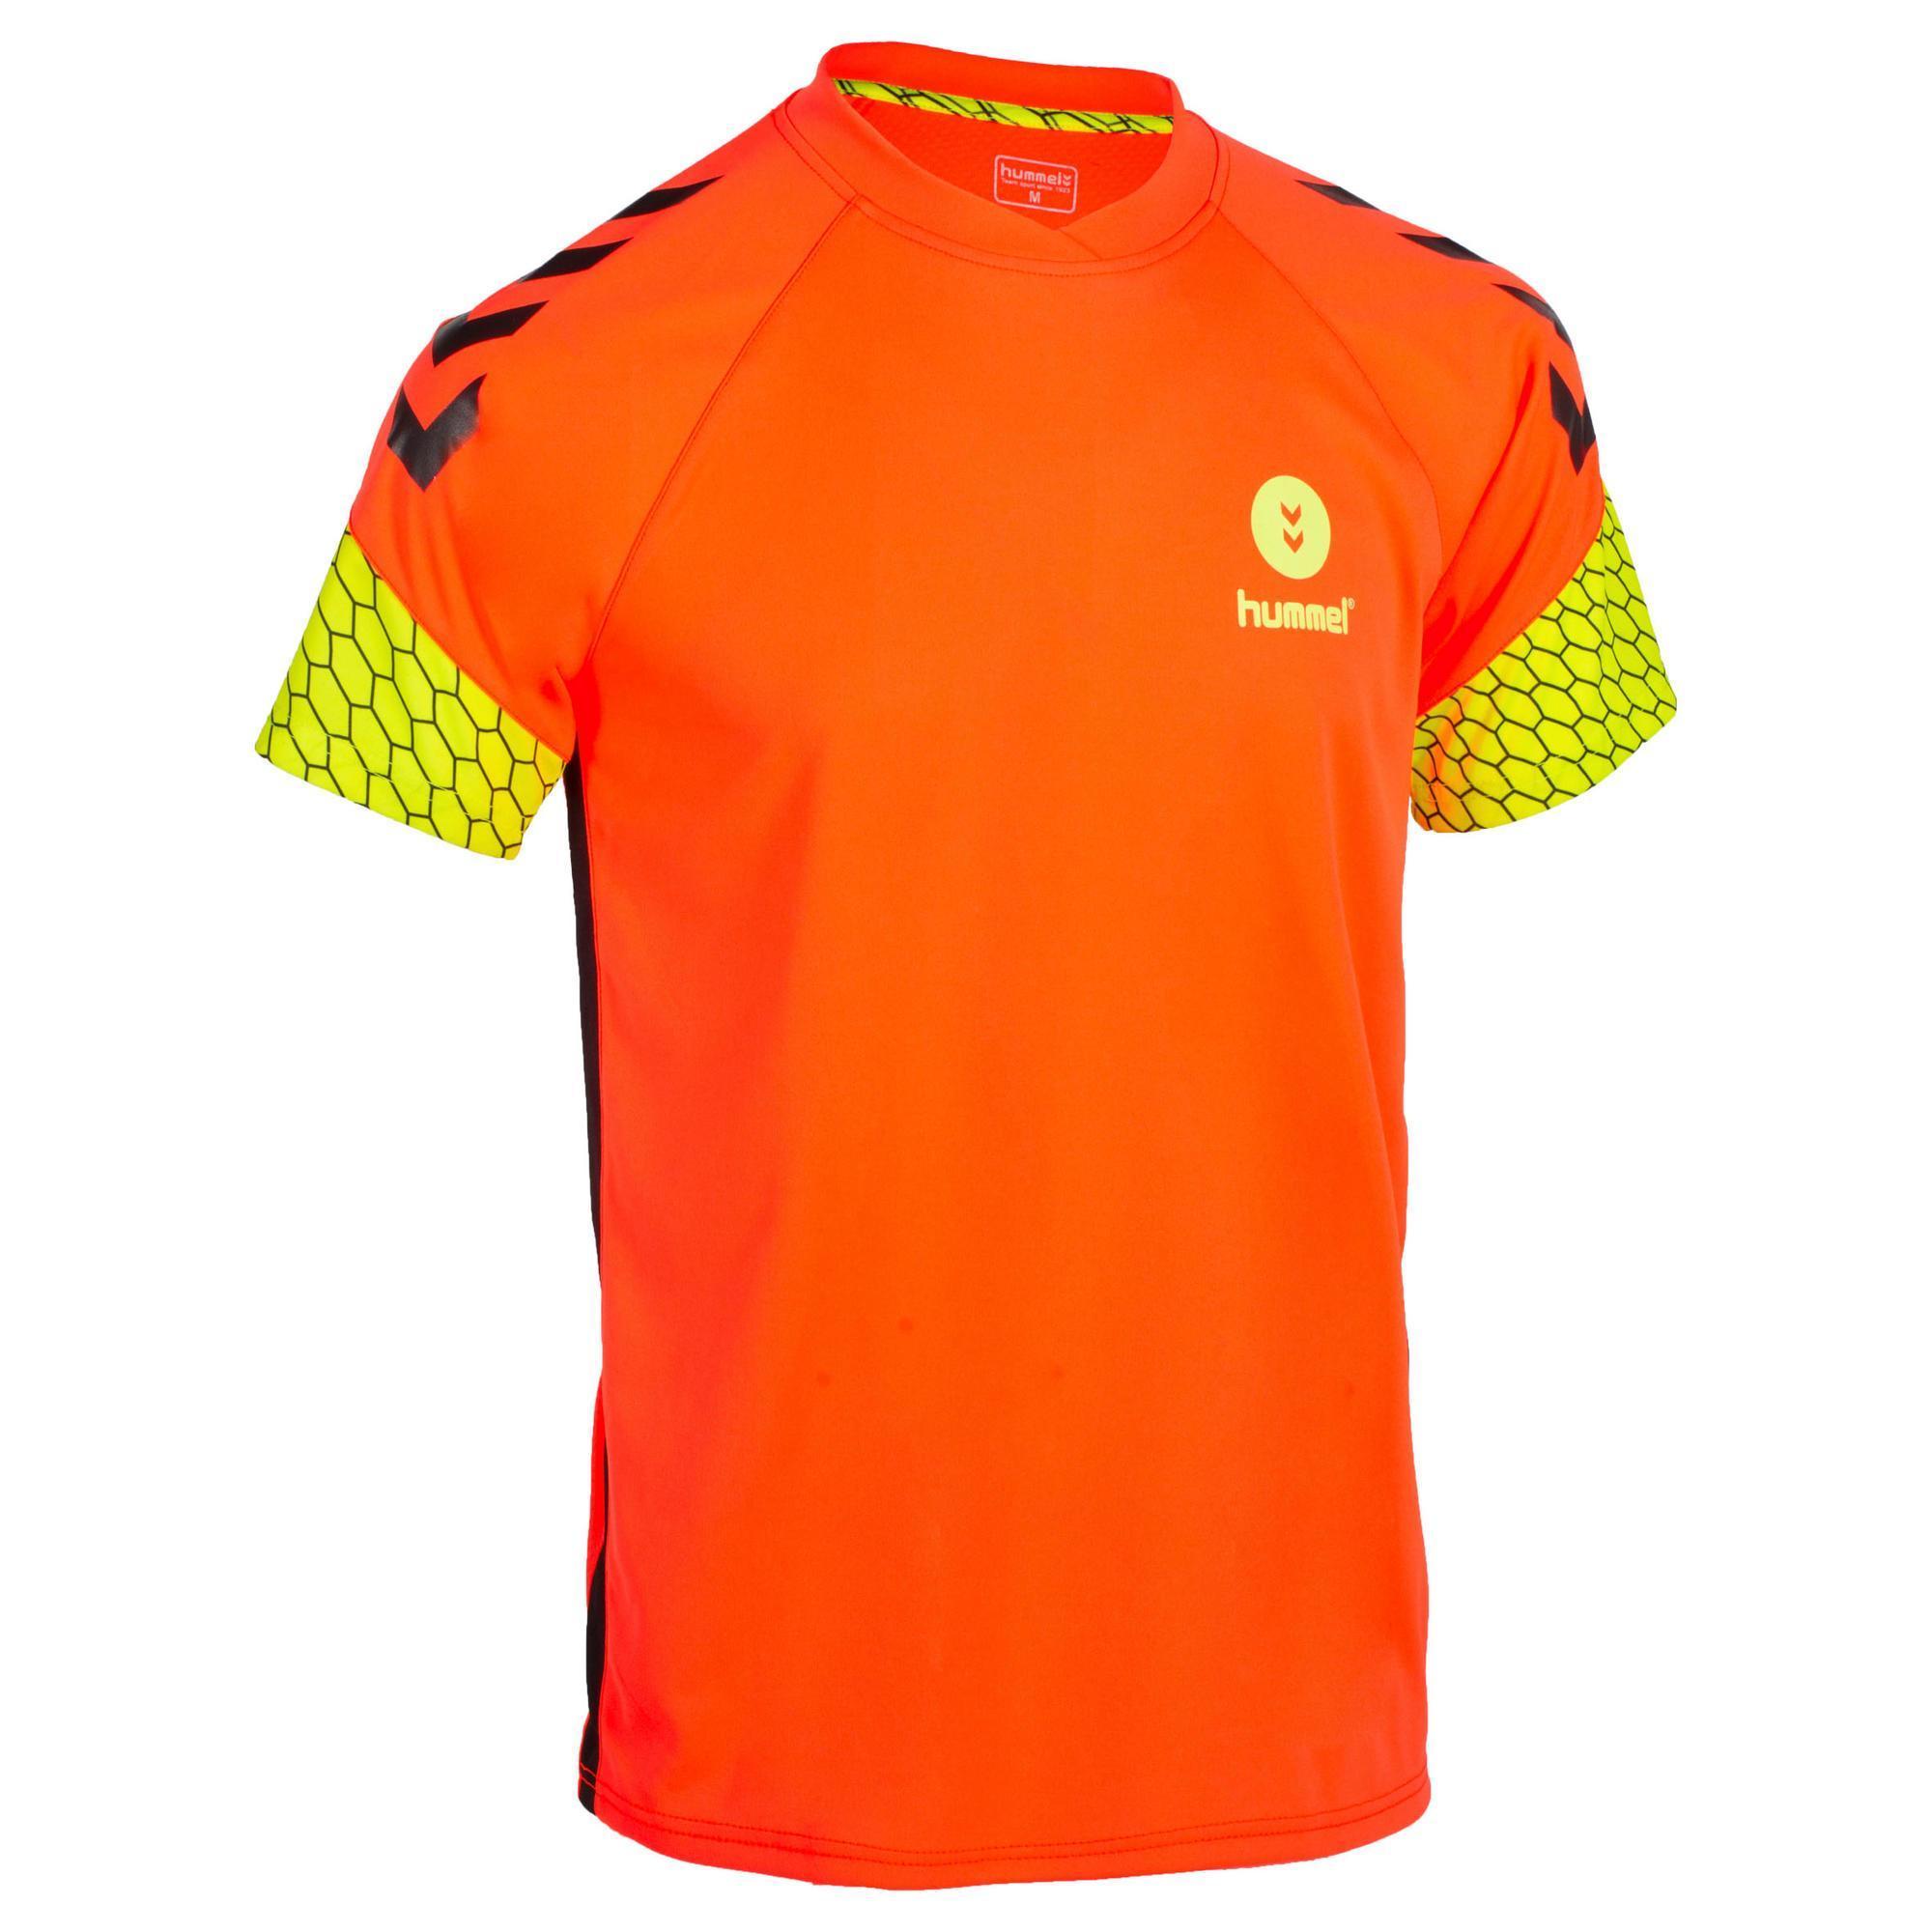 Handballtrikot Herren orange/gelb | Sportbekleidung > Trikots > Handballtrikots | Hummel